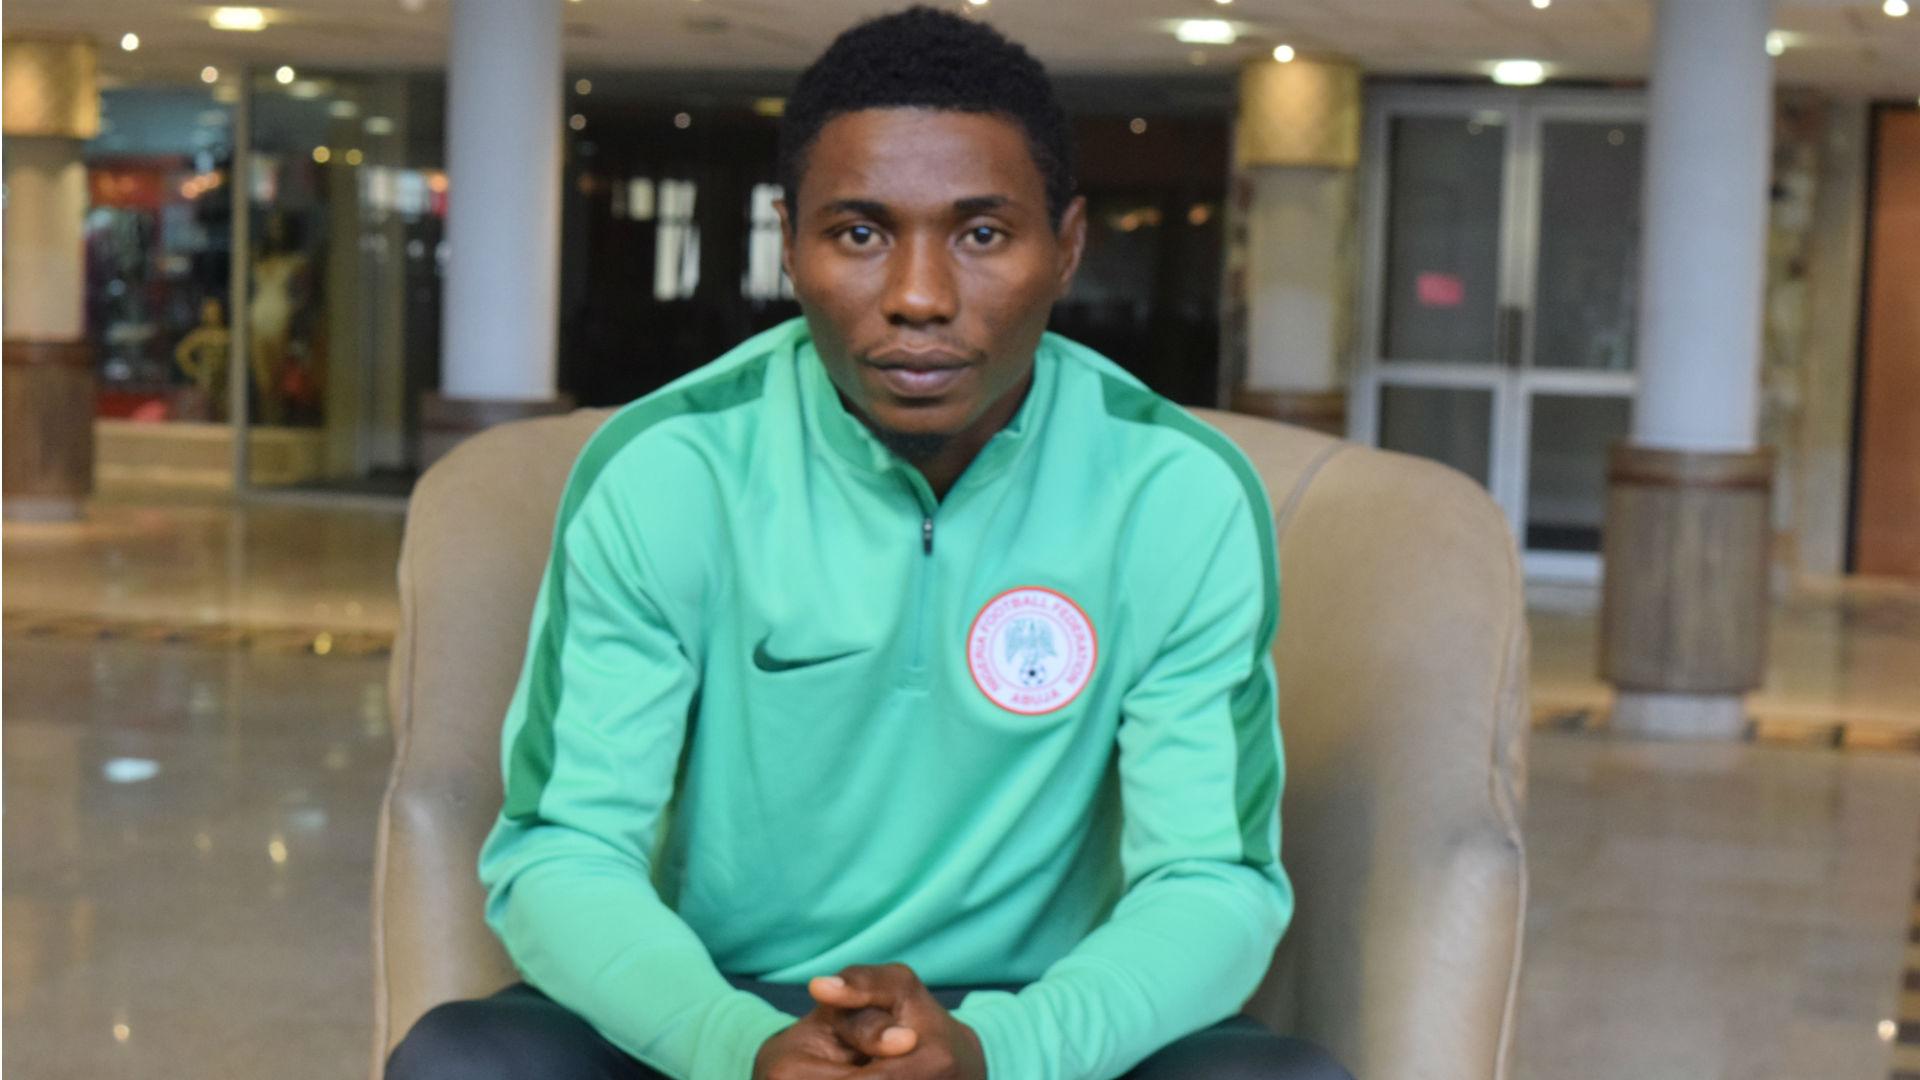 Enyimba confirm kidnapping of Nigeria international Dayo Ojo by gunmen